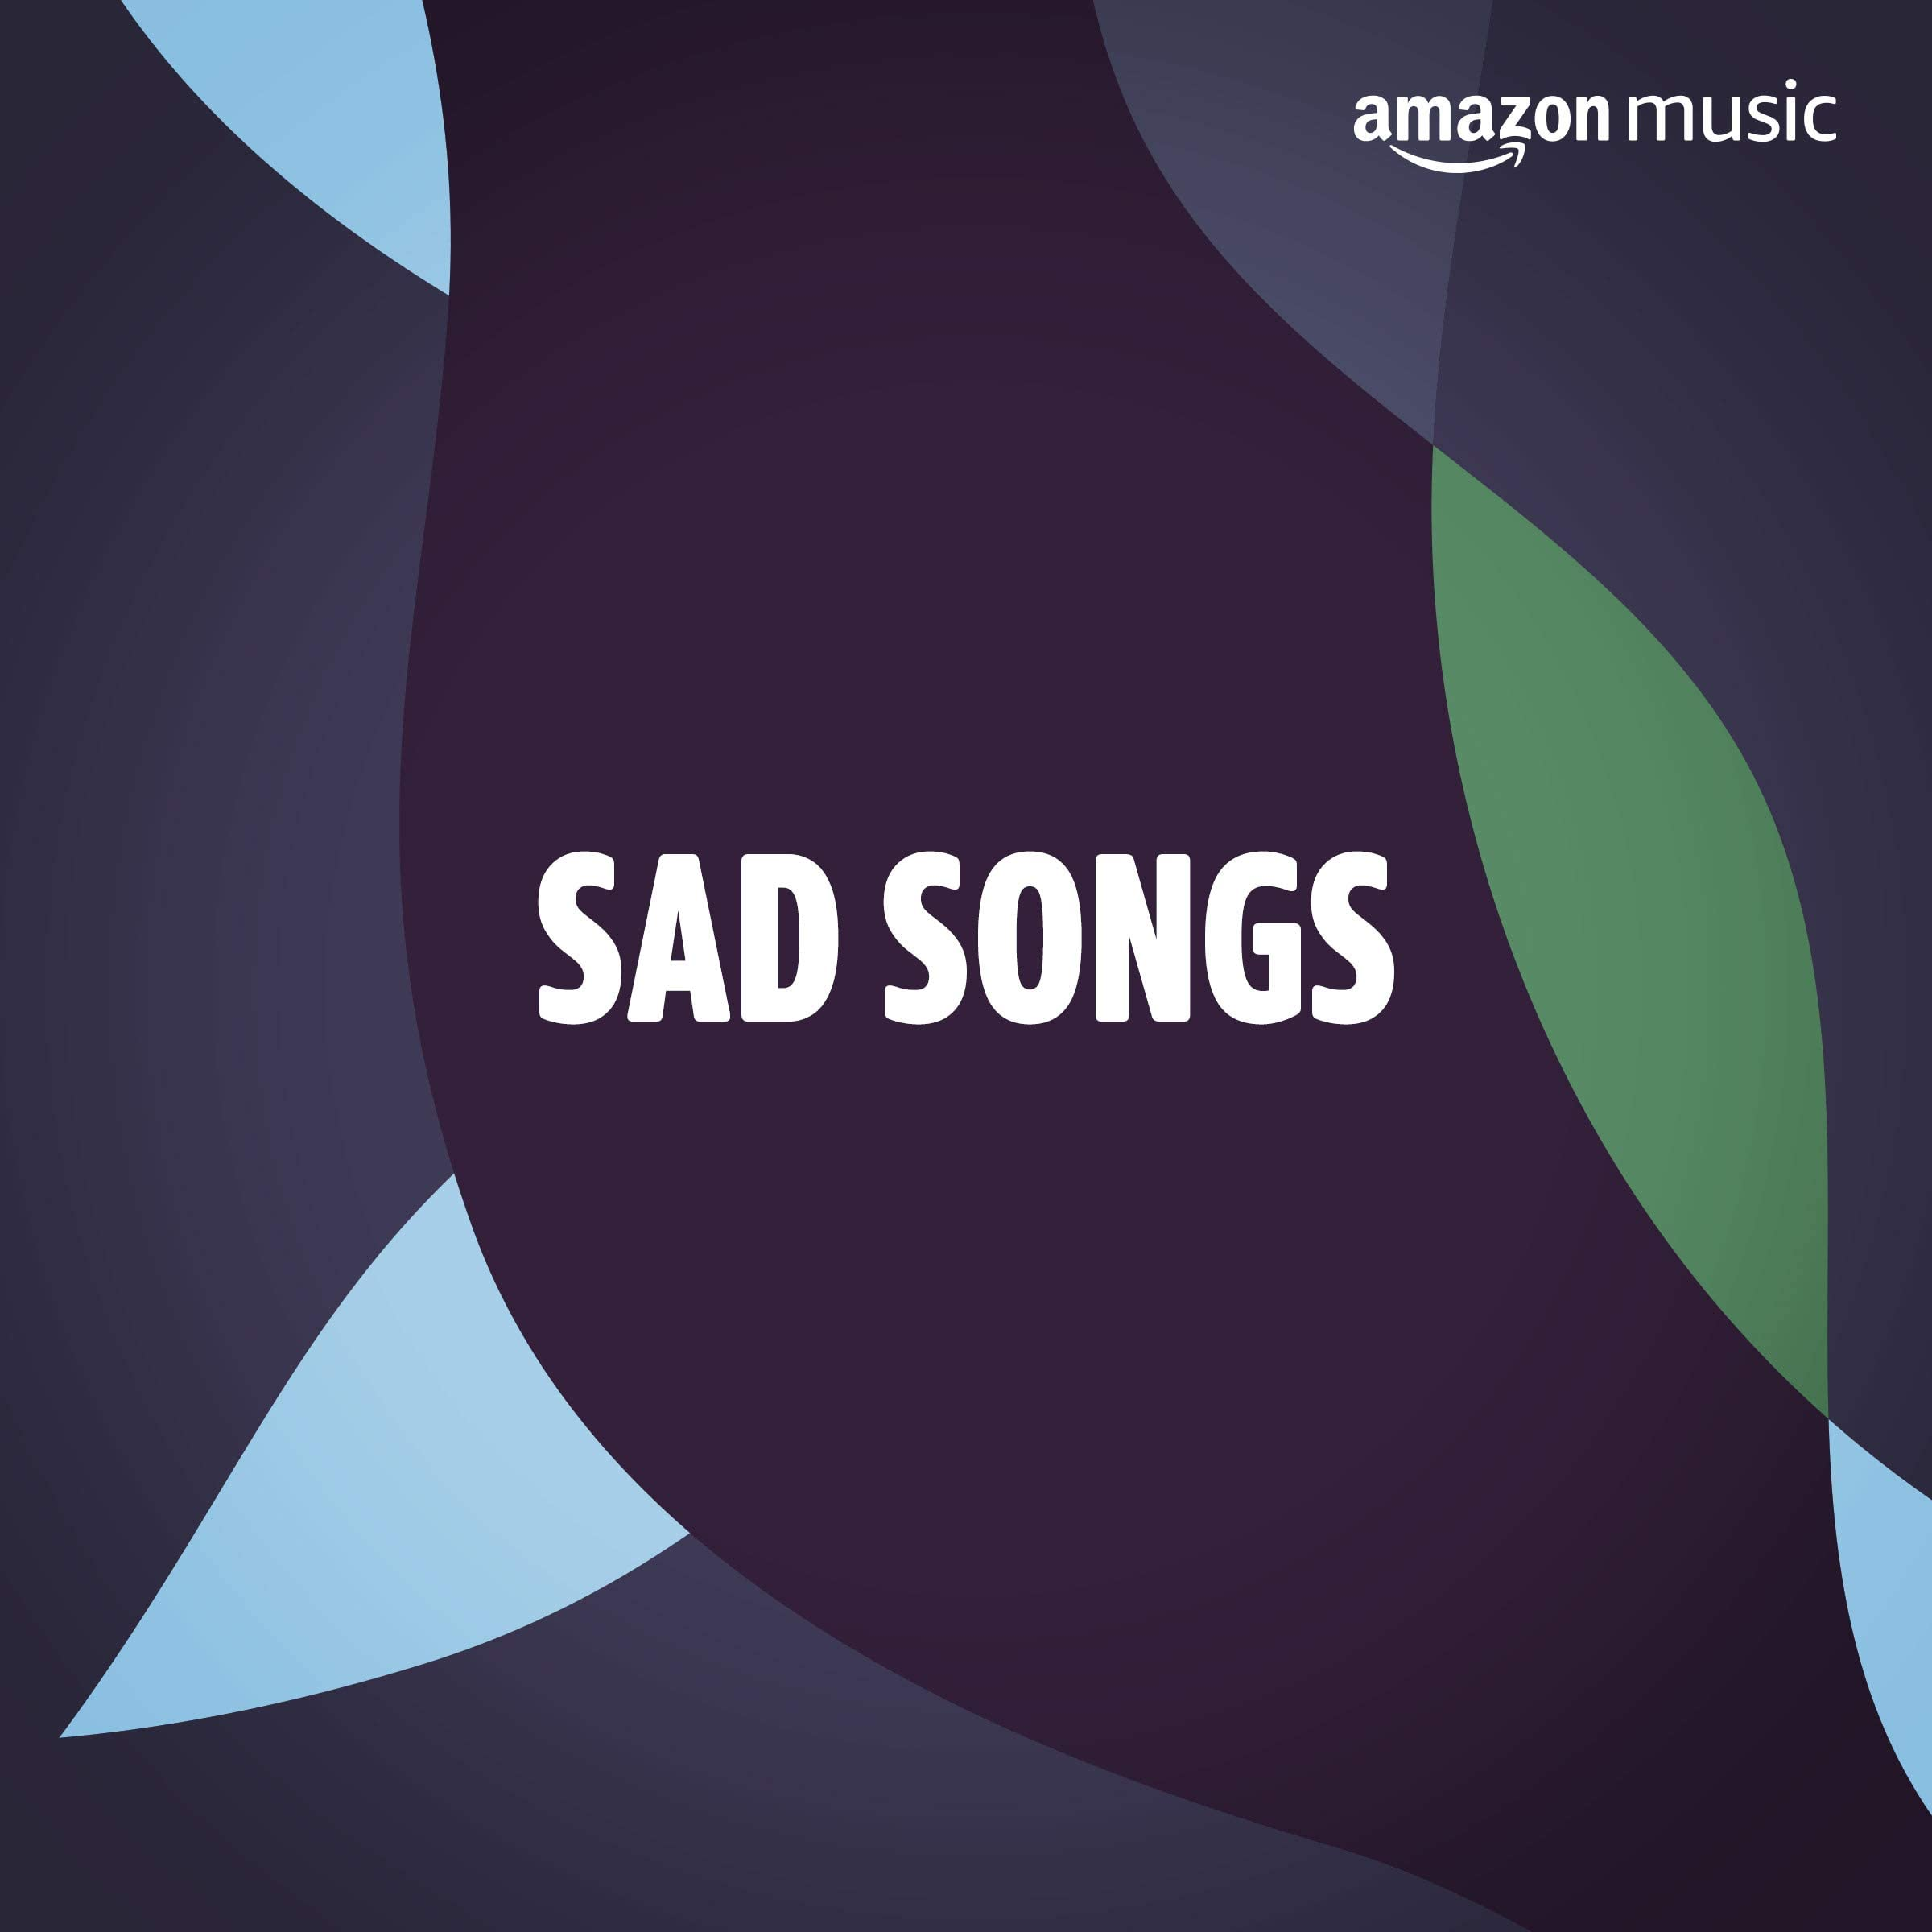 Canciones Tristes